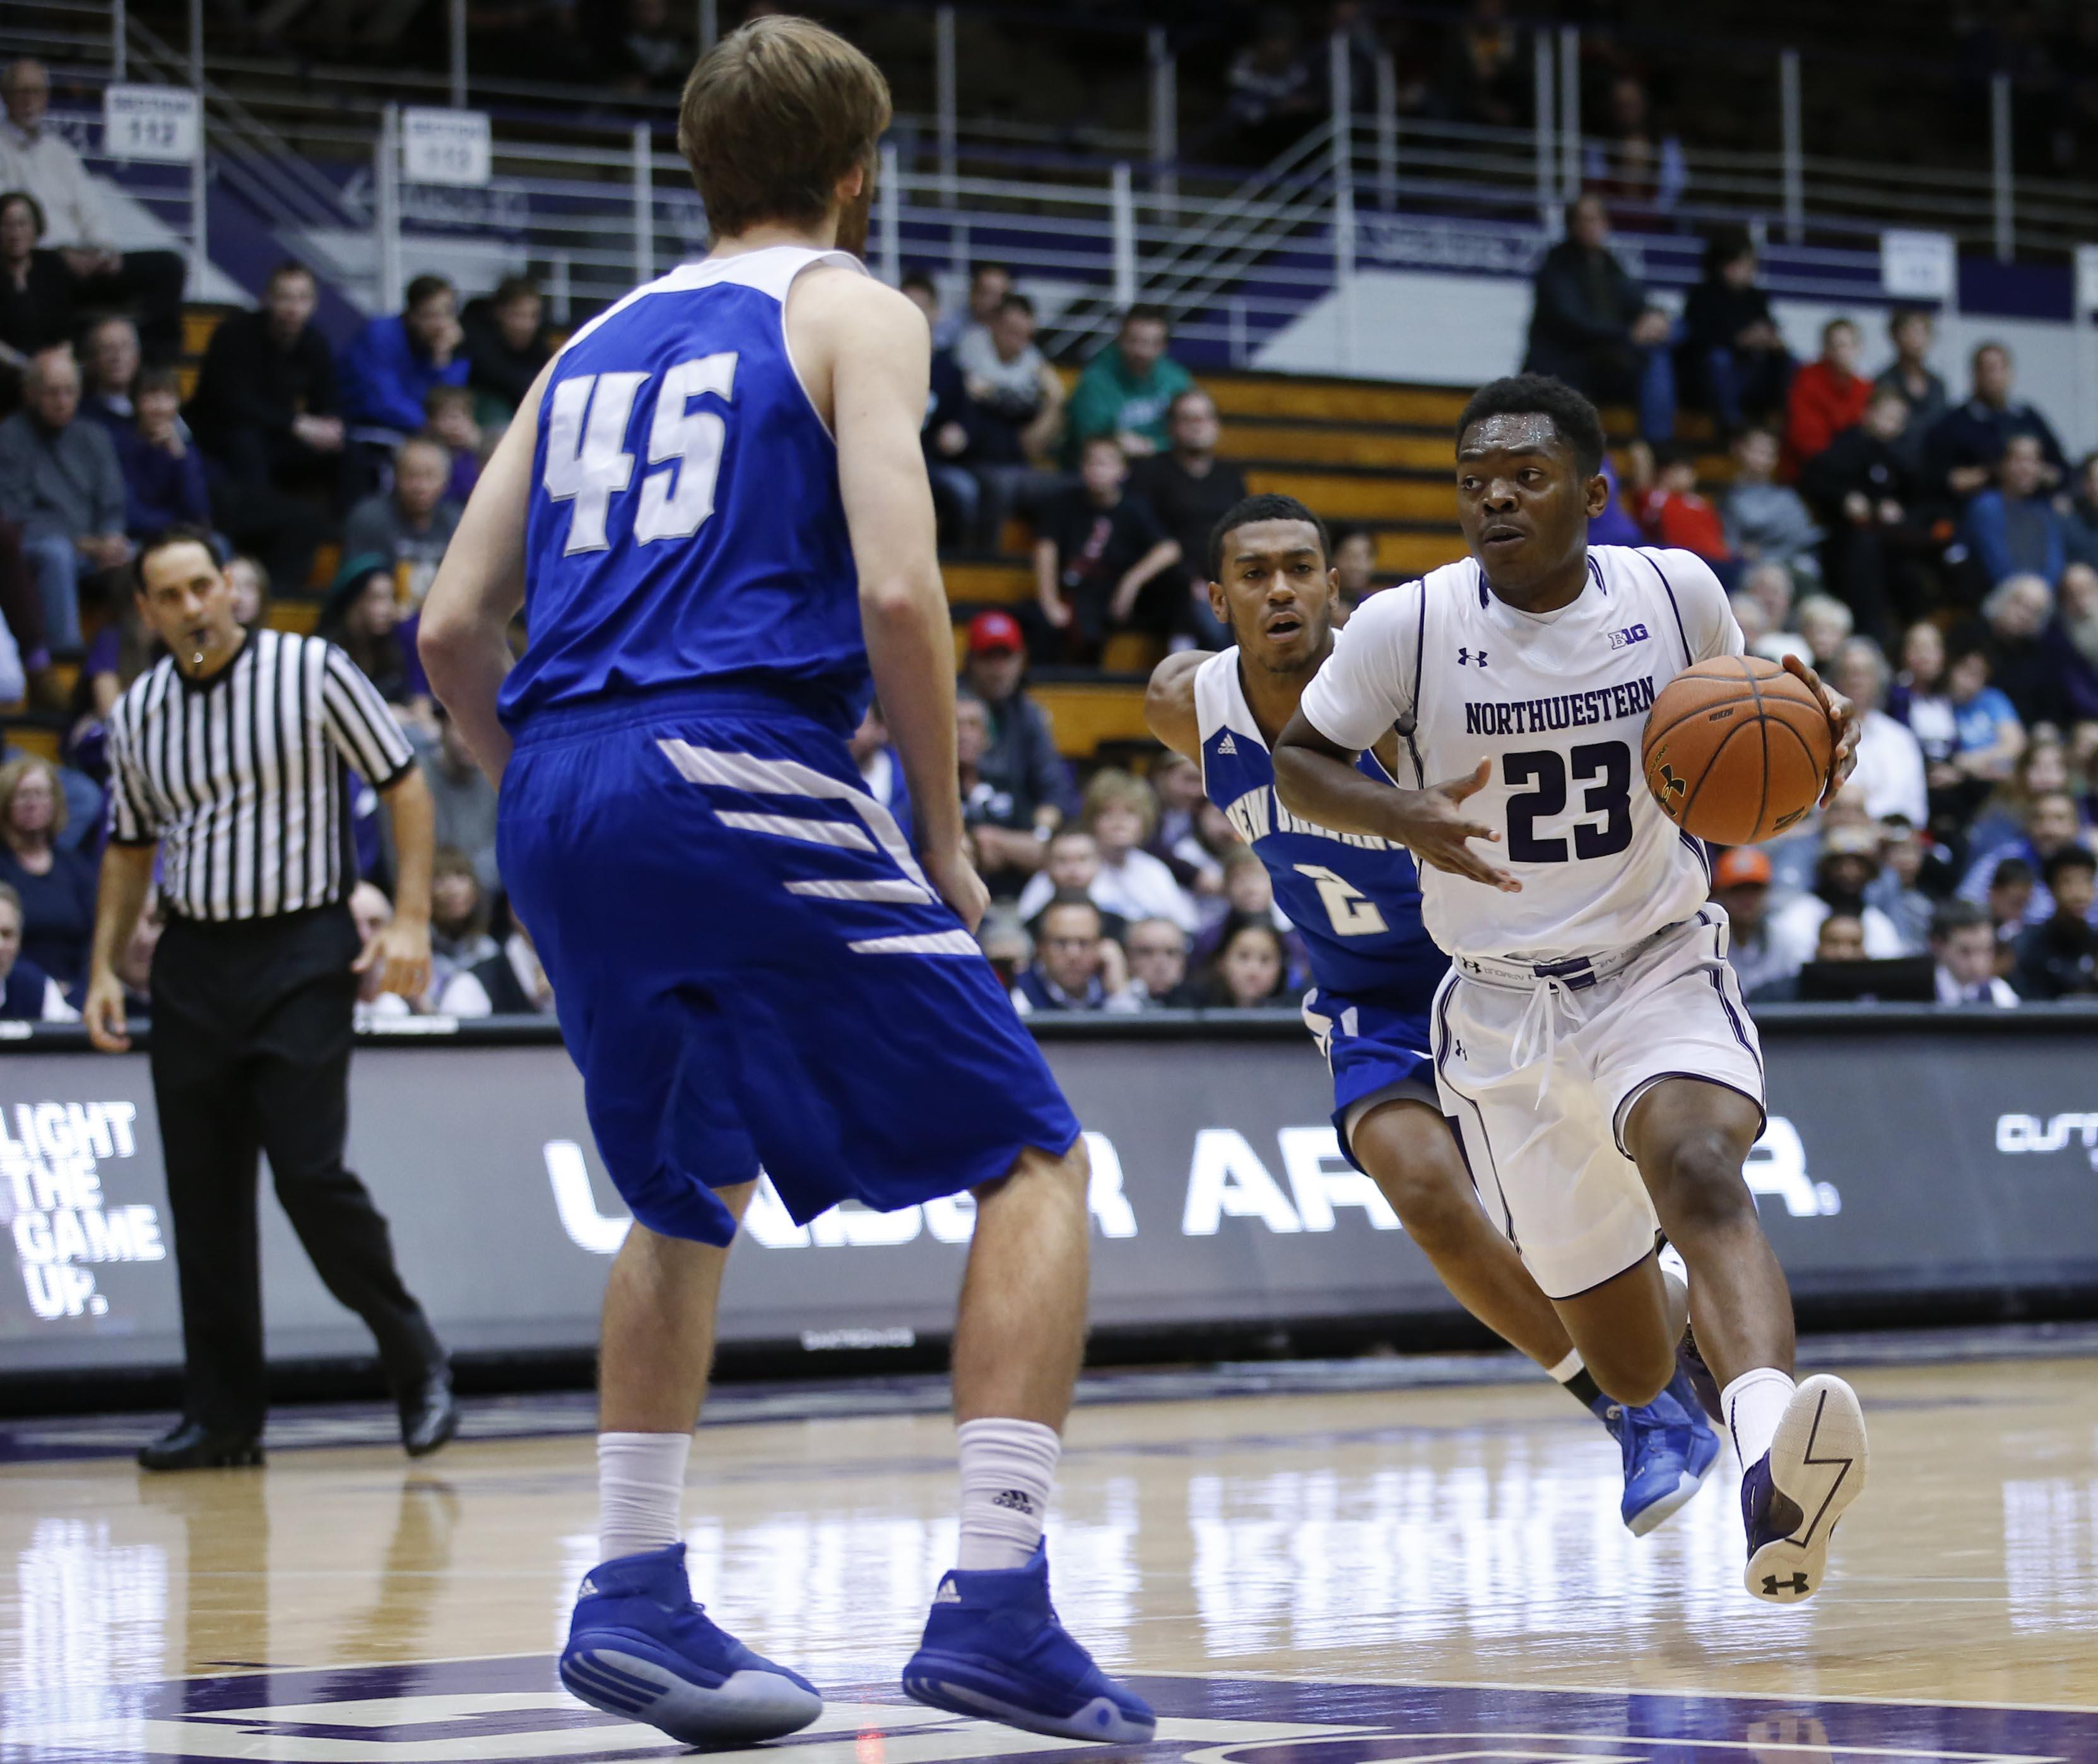 NCAA Basketball: New Orleans at Northwestern